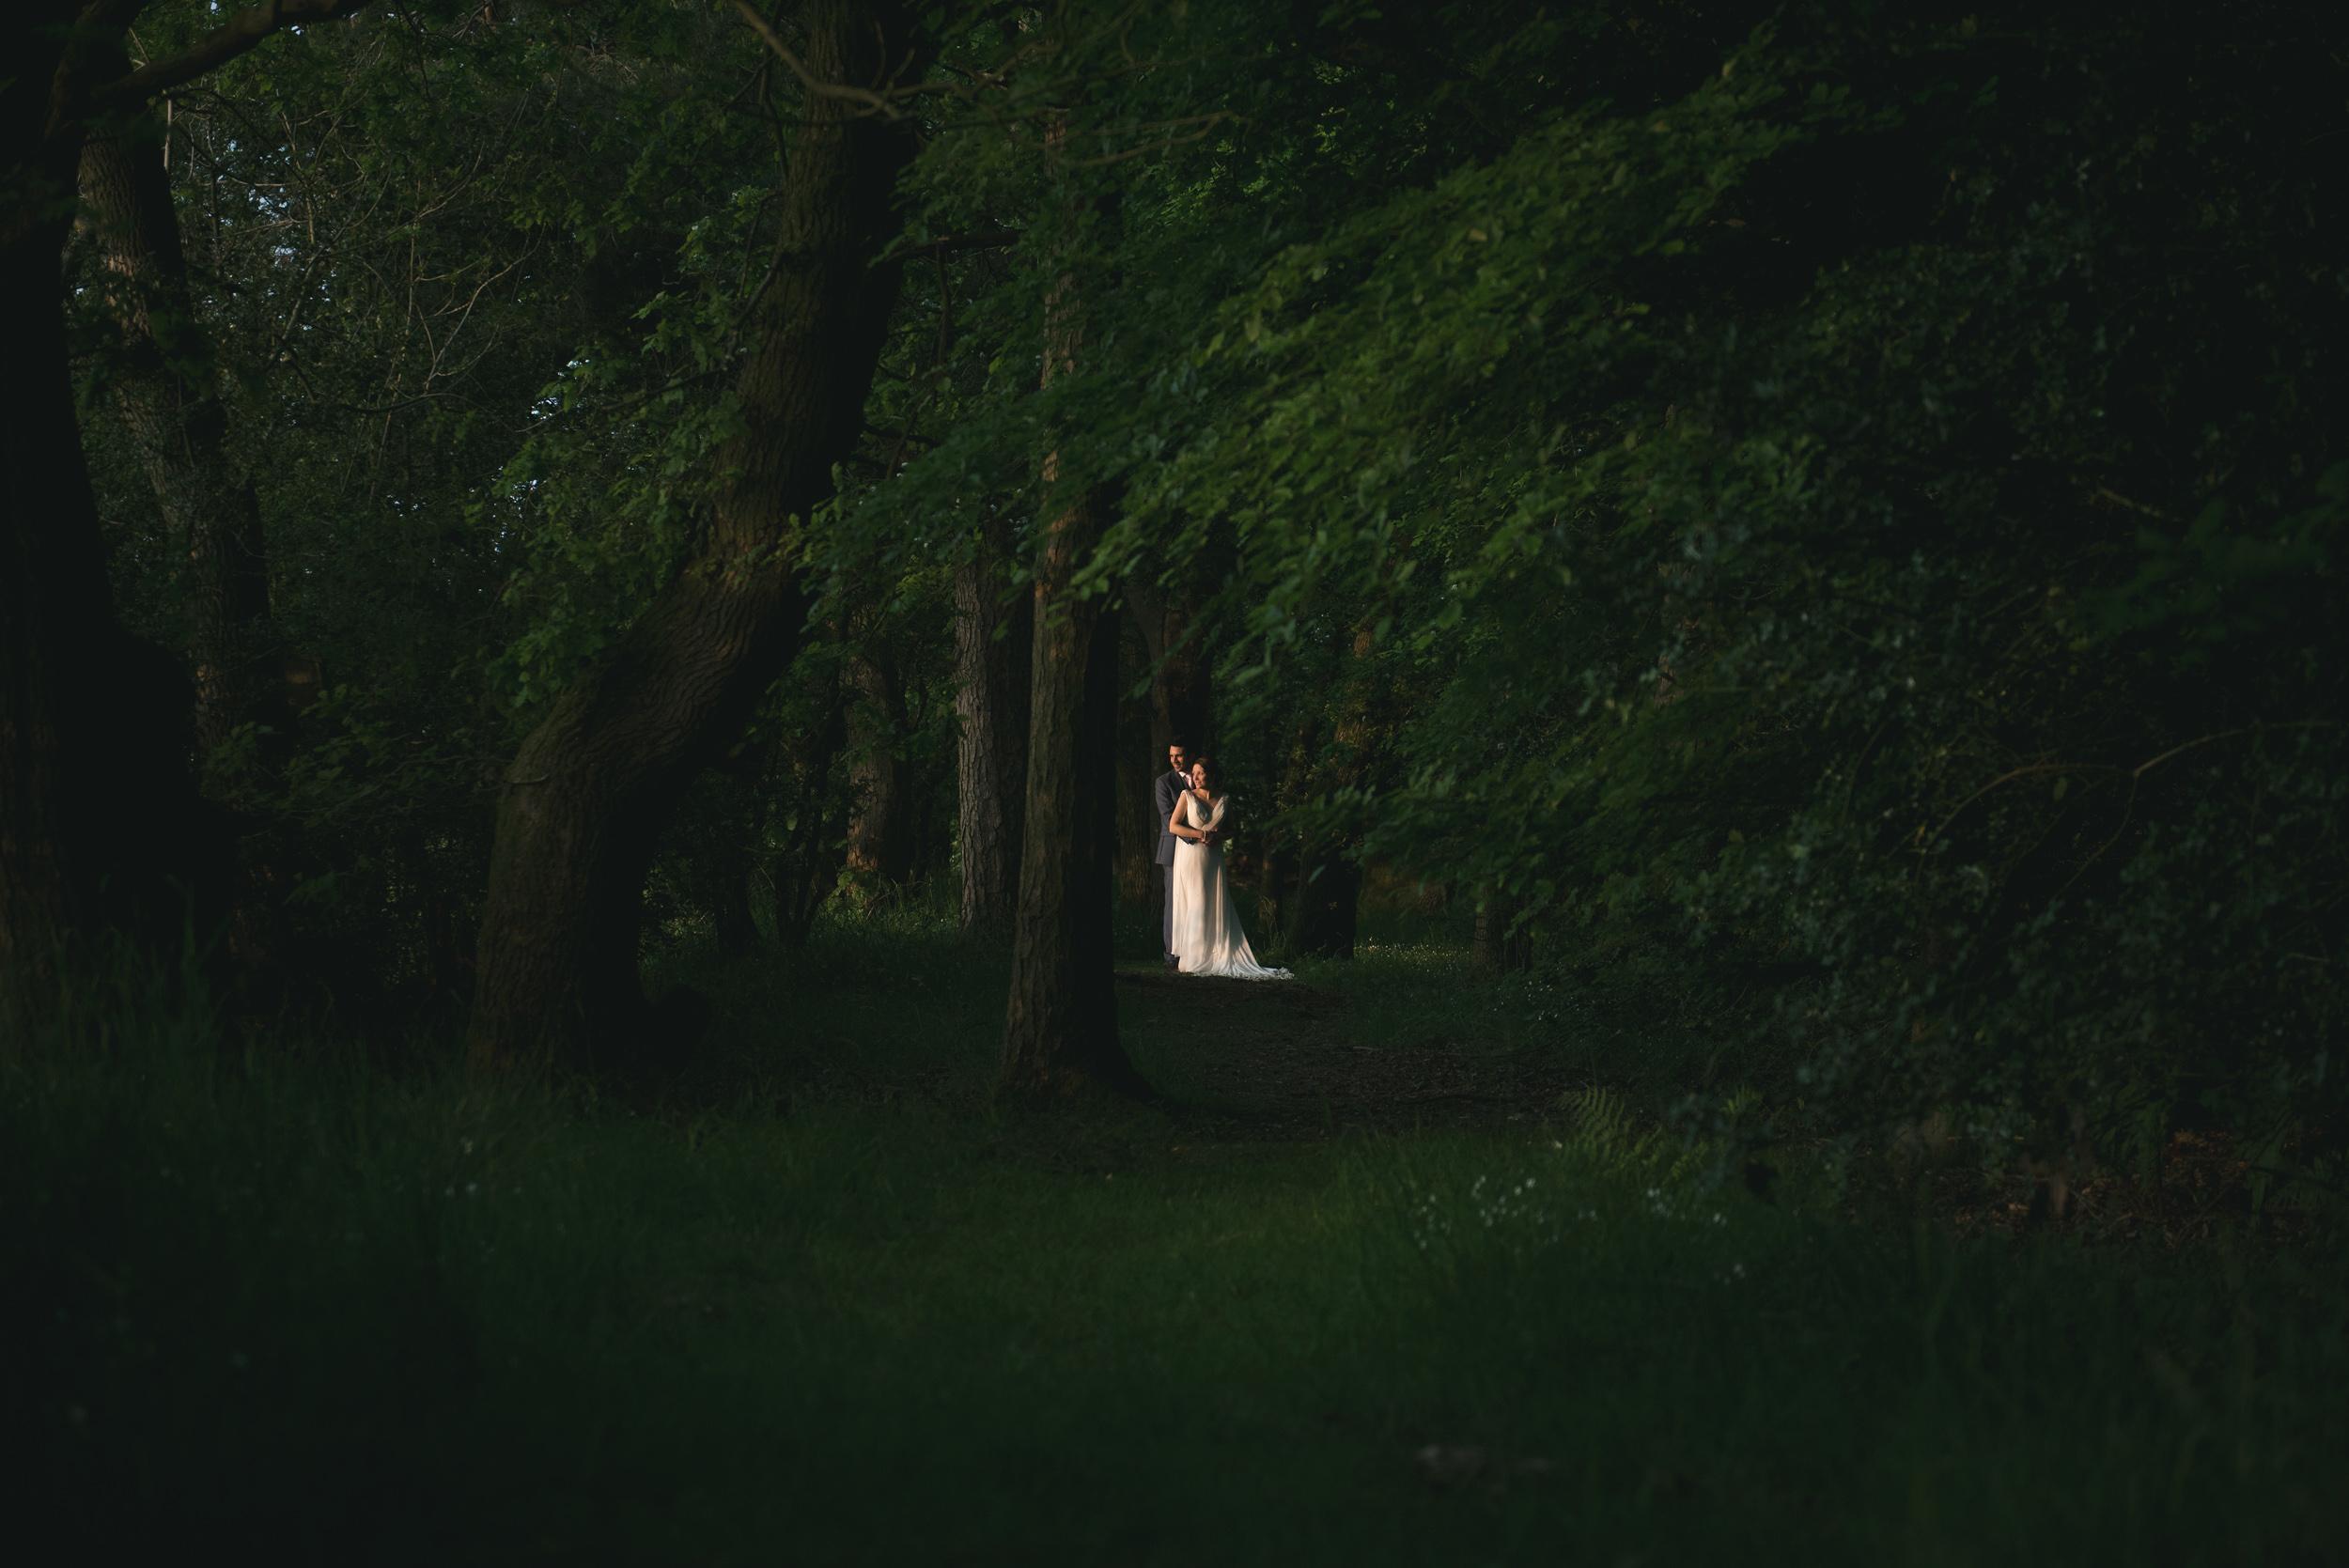 David Scholes Lancashire wedding photography 2016-109.jpg